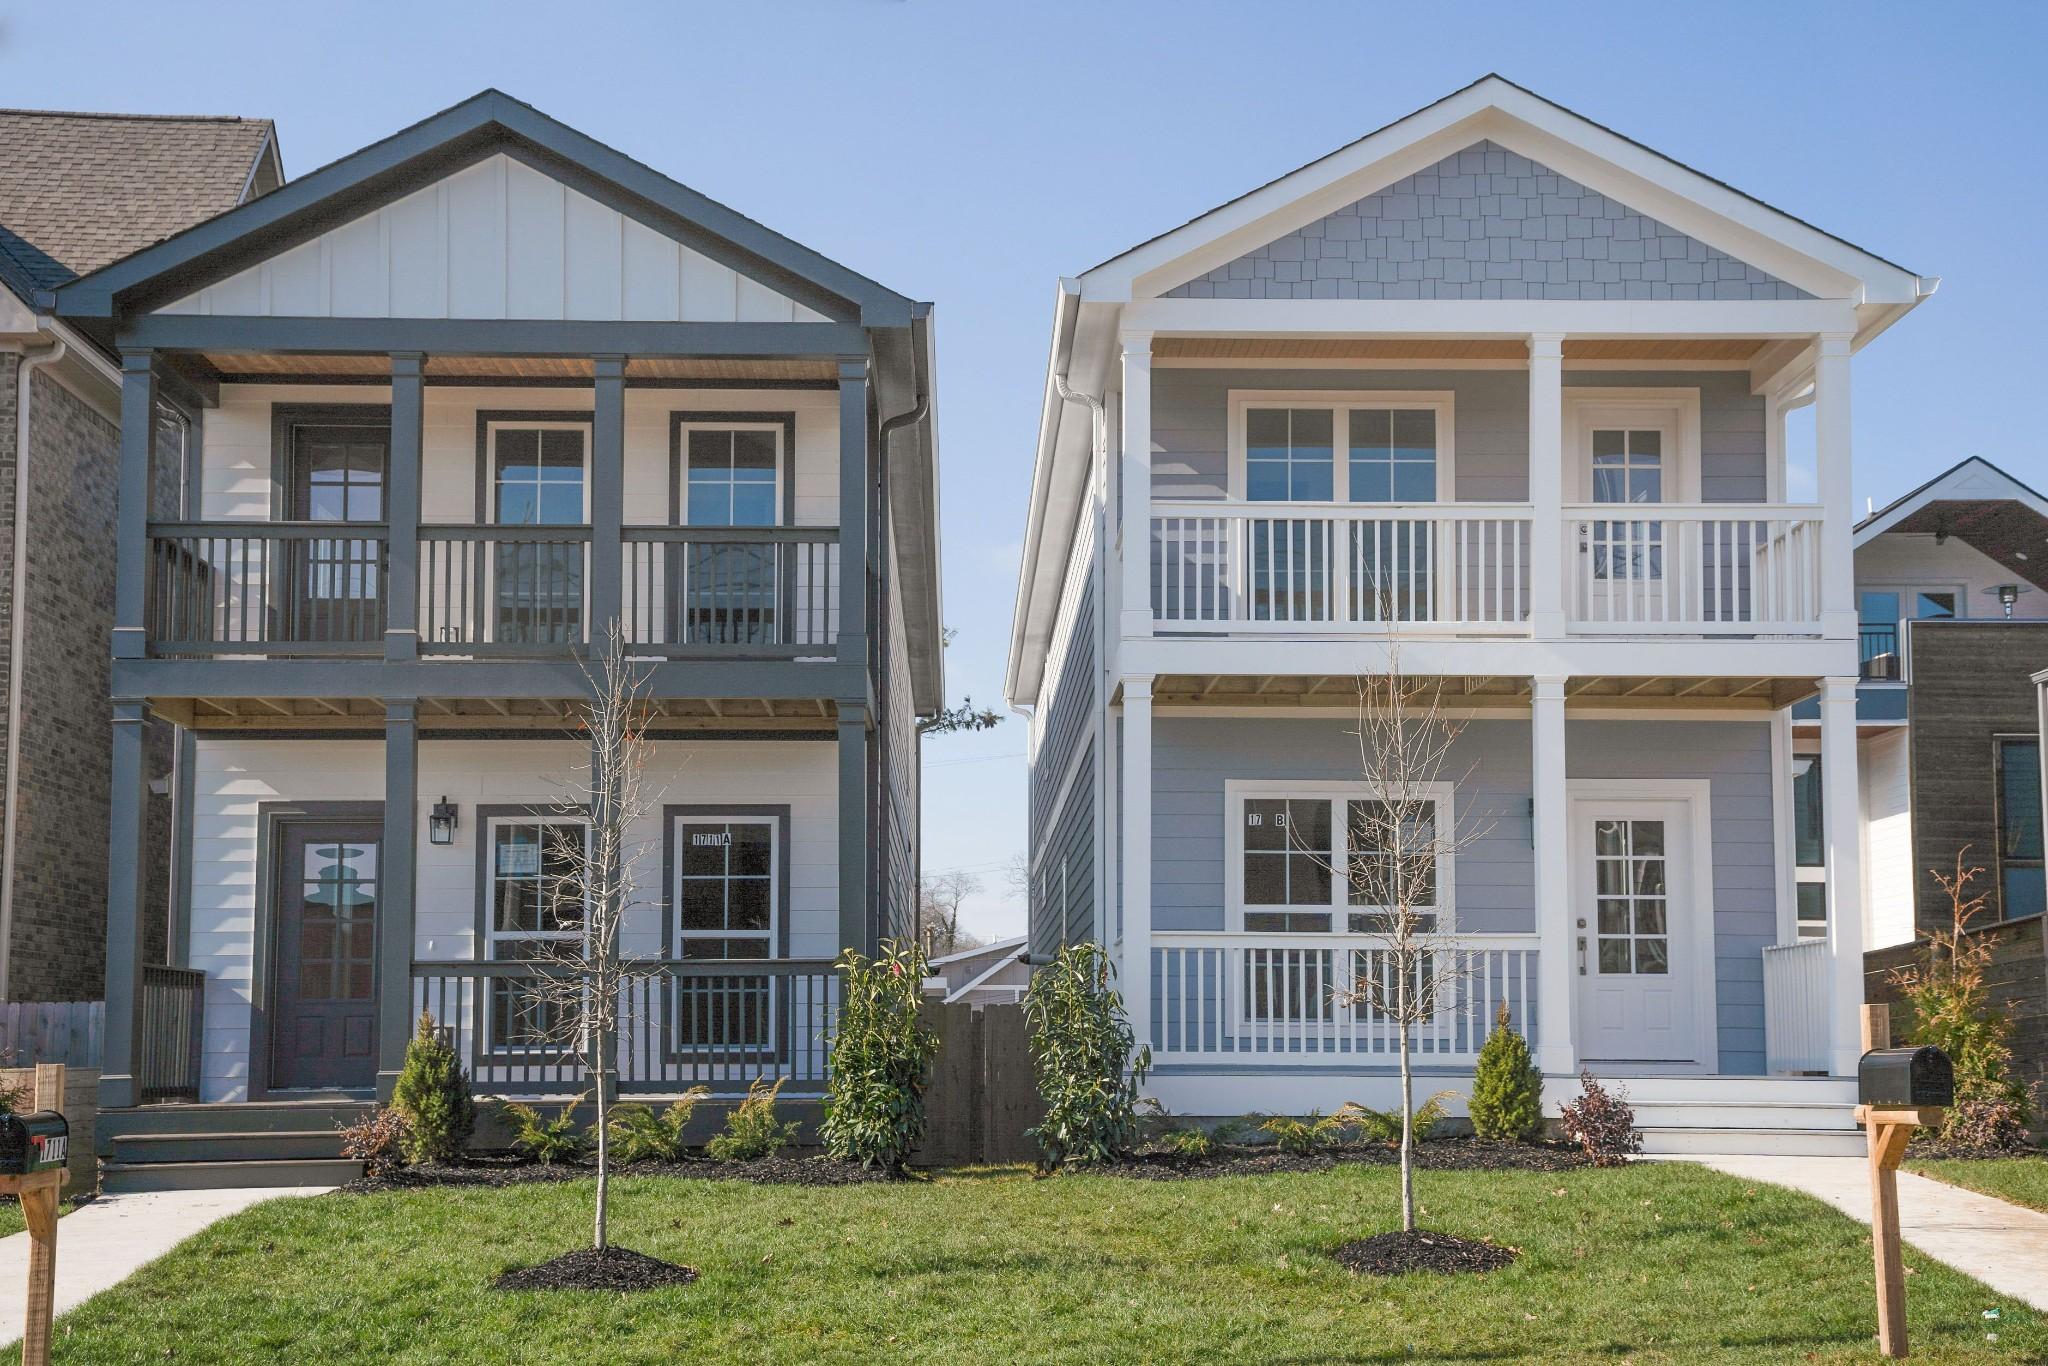 1711B 3rd Ave , N, Nashville, TN 37208 - Nashville, TN real estate listing